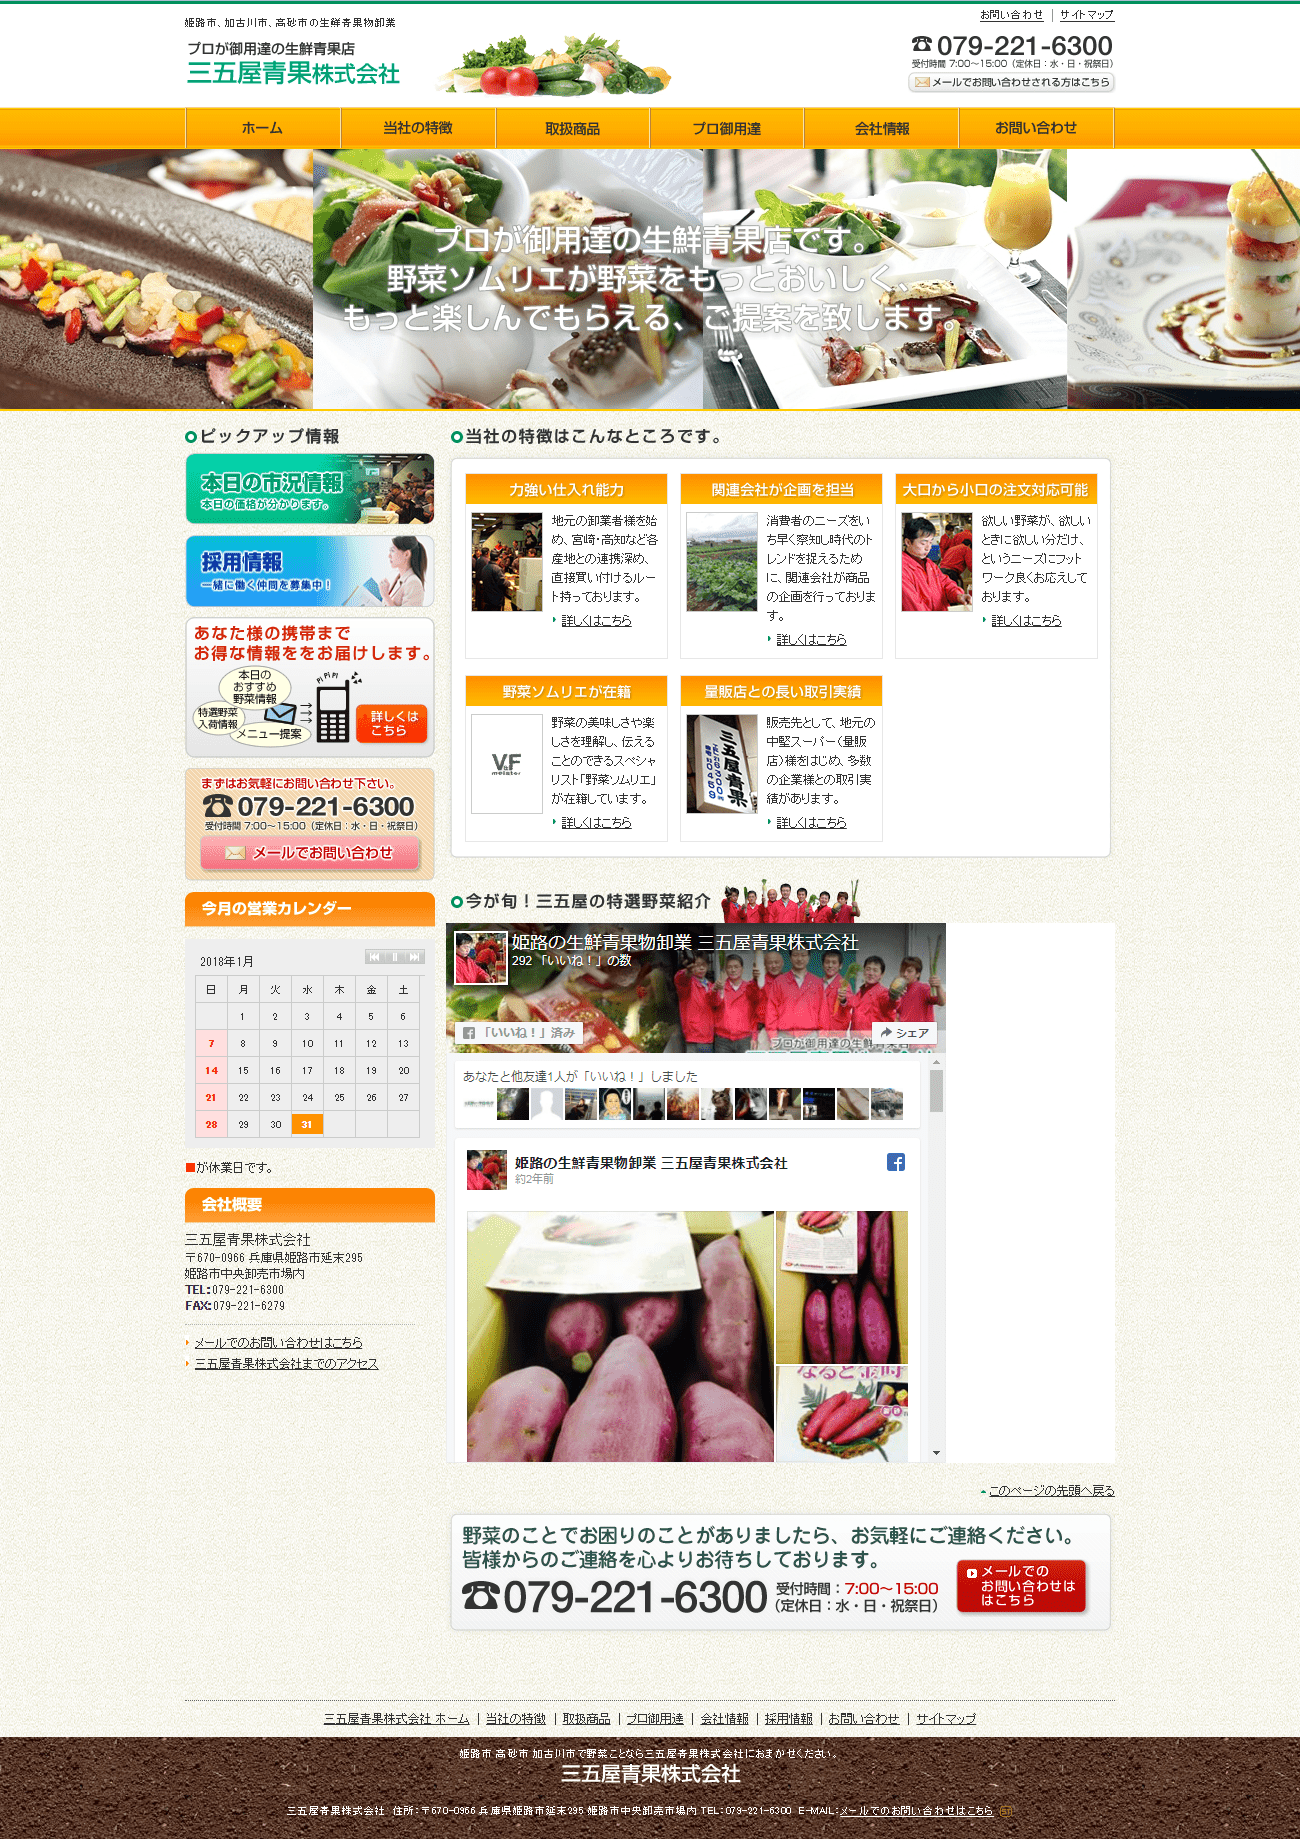 姫路市 三五屋青果株式会社様 ホームページ制作1